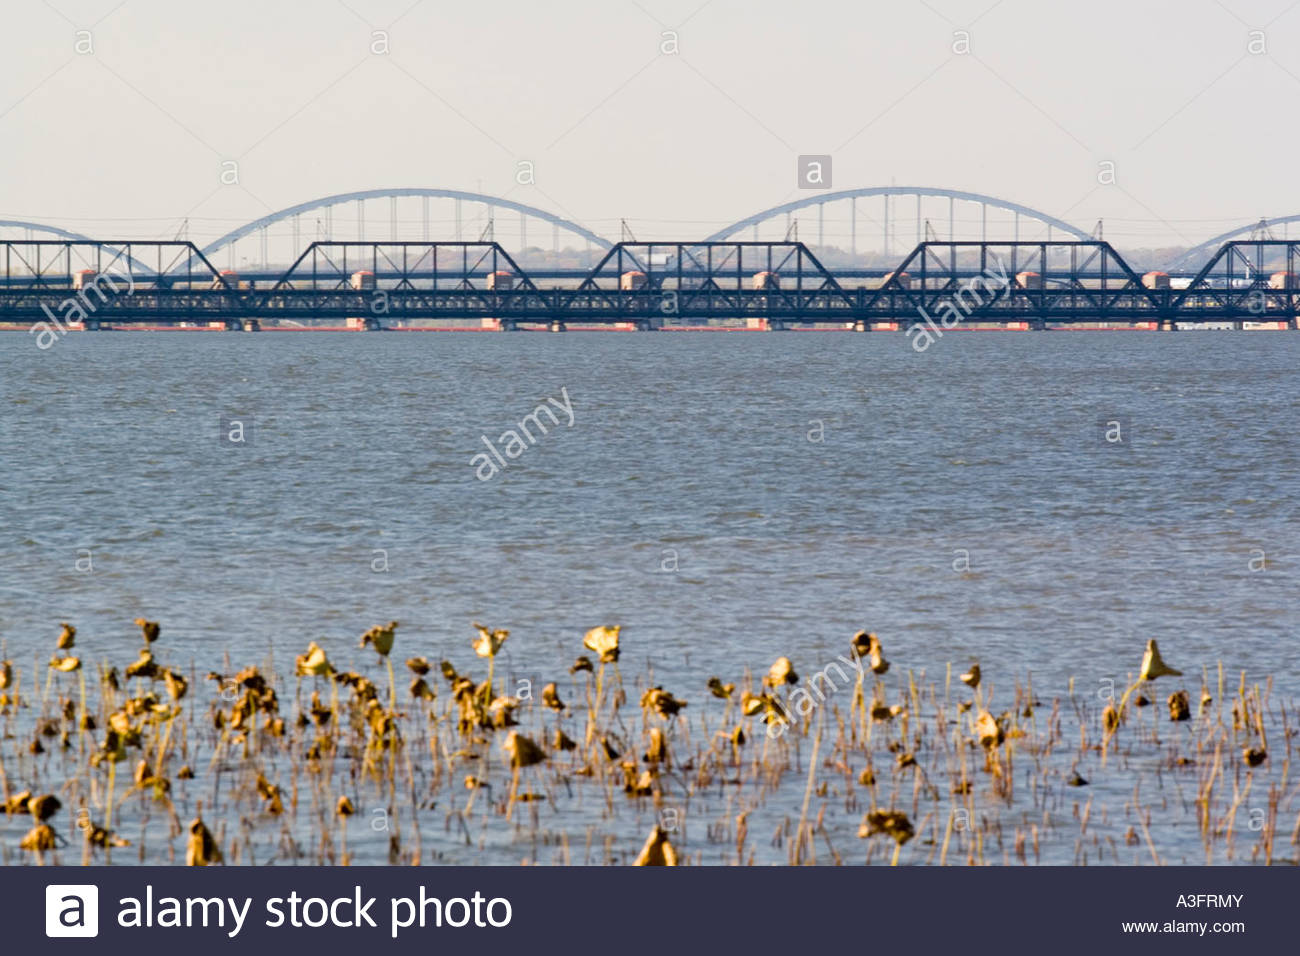 Davenport Iowa USA Mississippi River and Centennial Bridge in the 1300x956